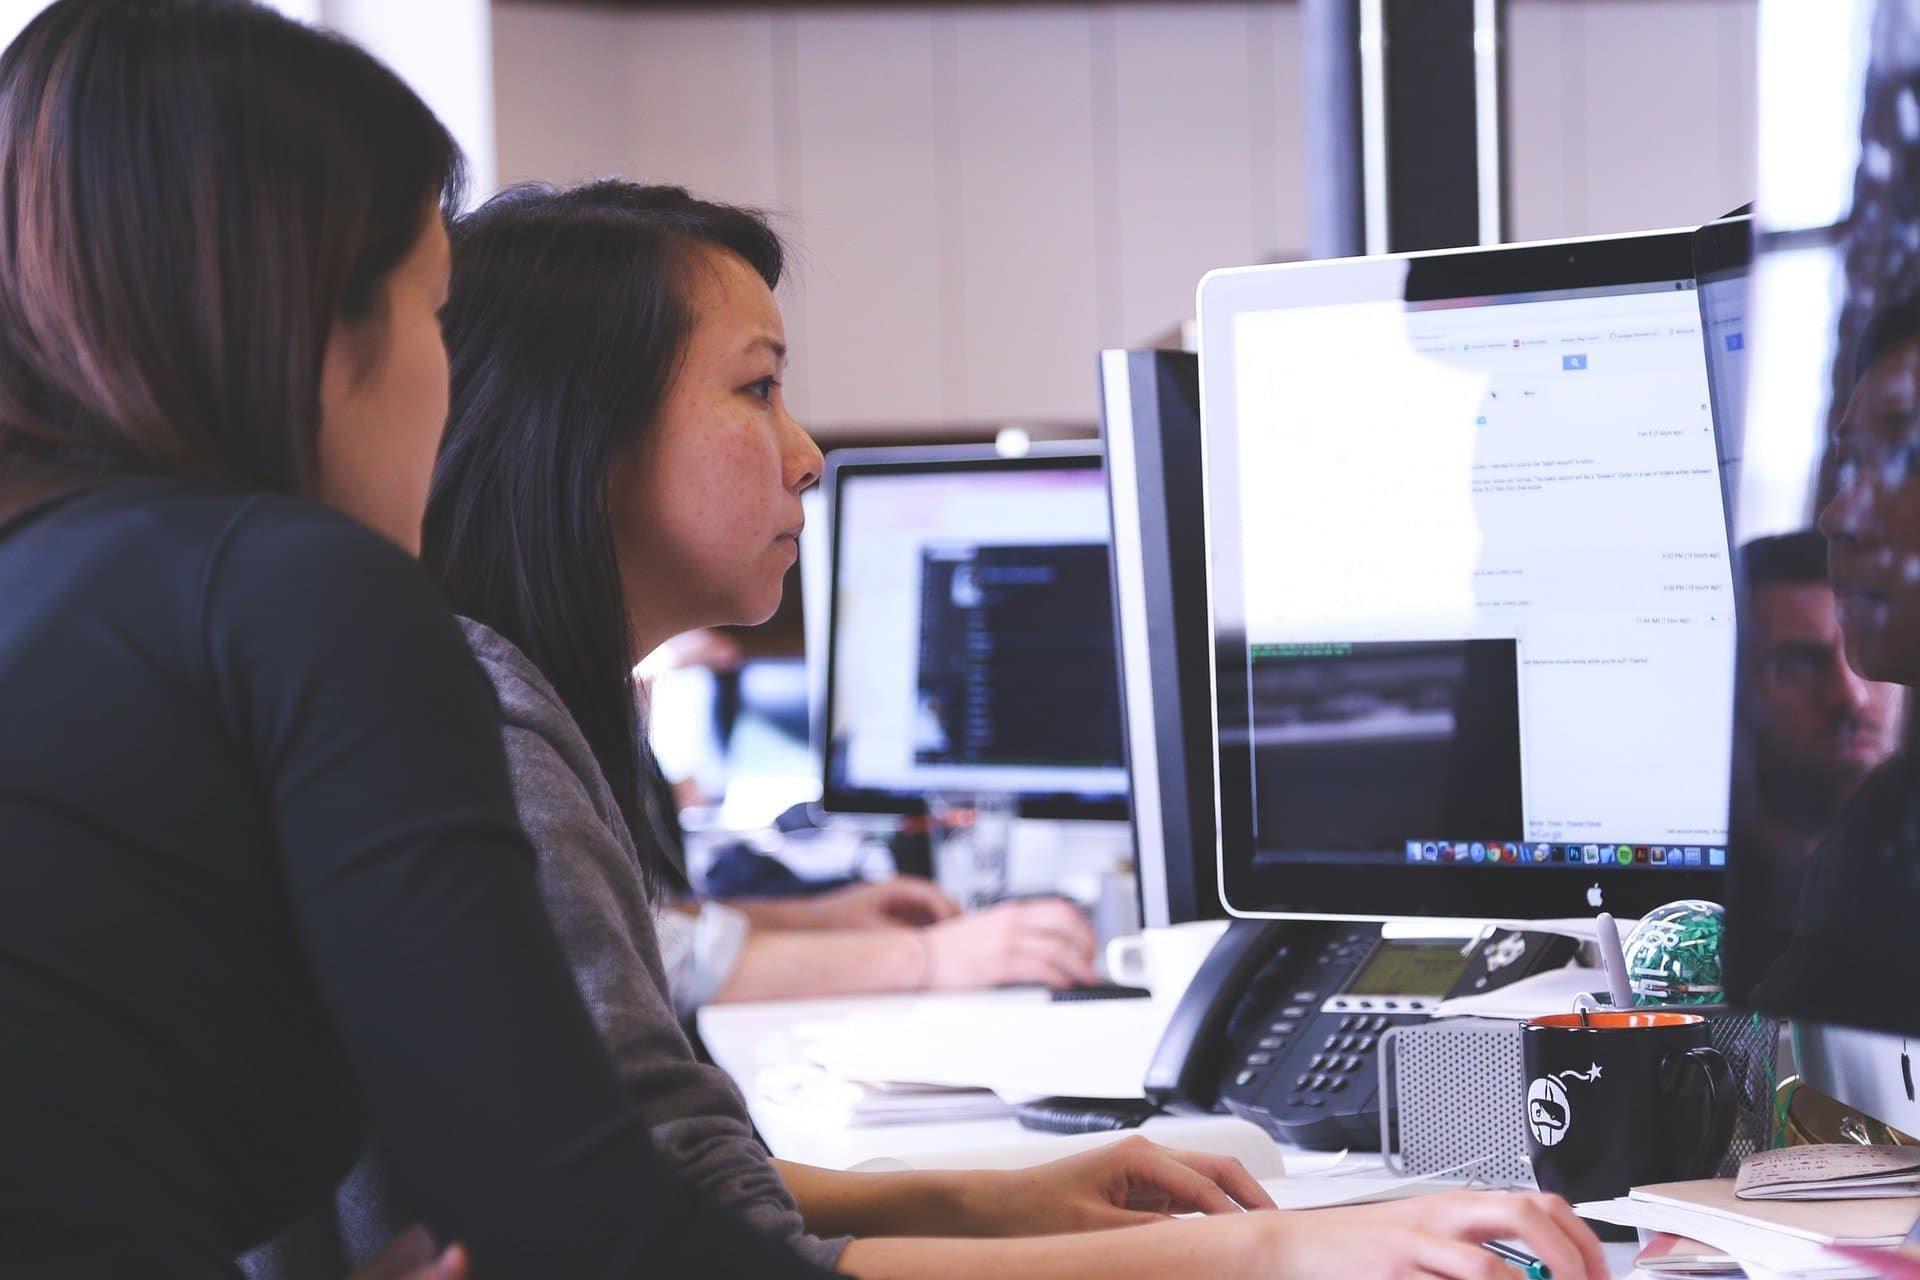 women-monitoring-computer-screens